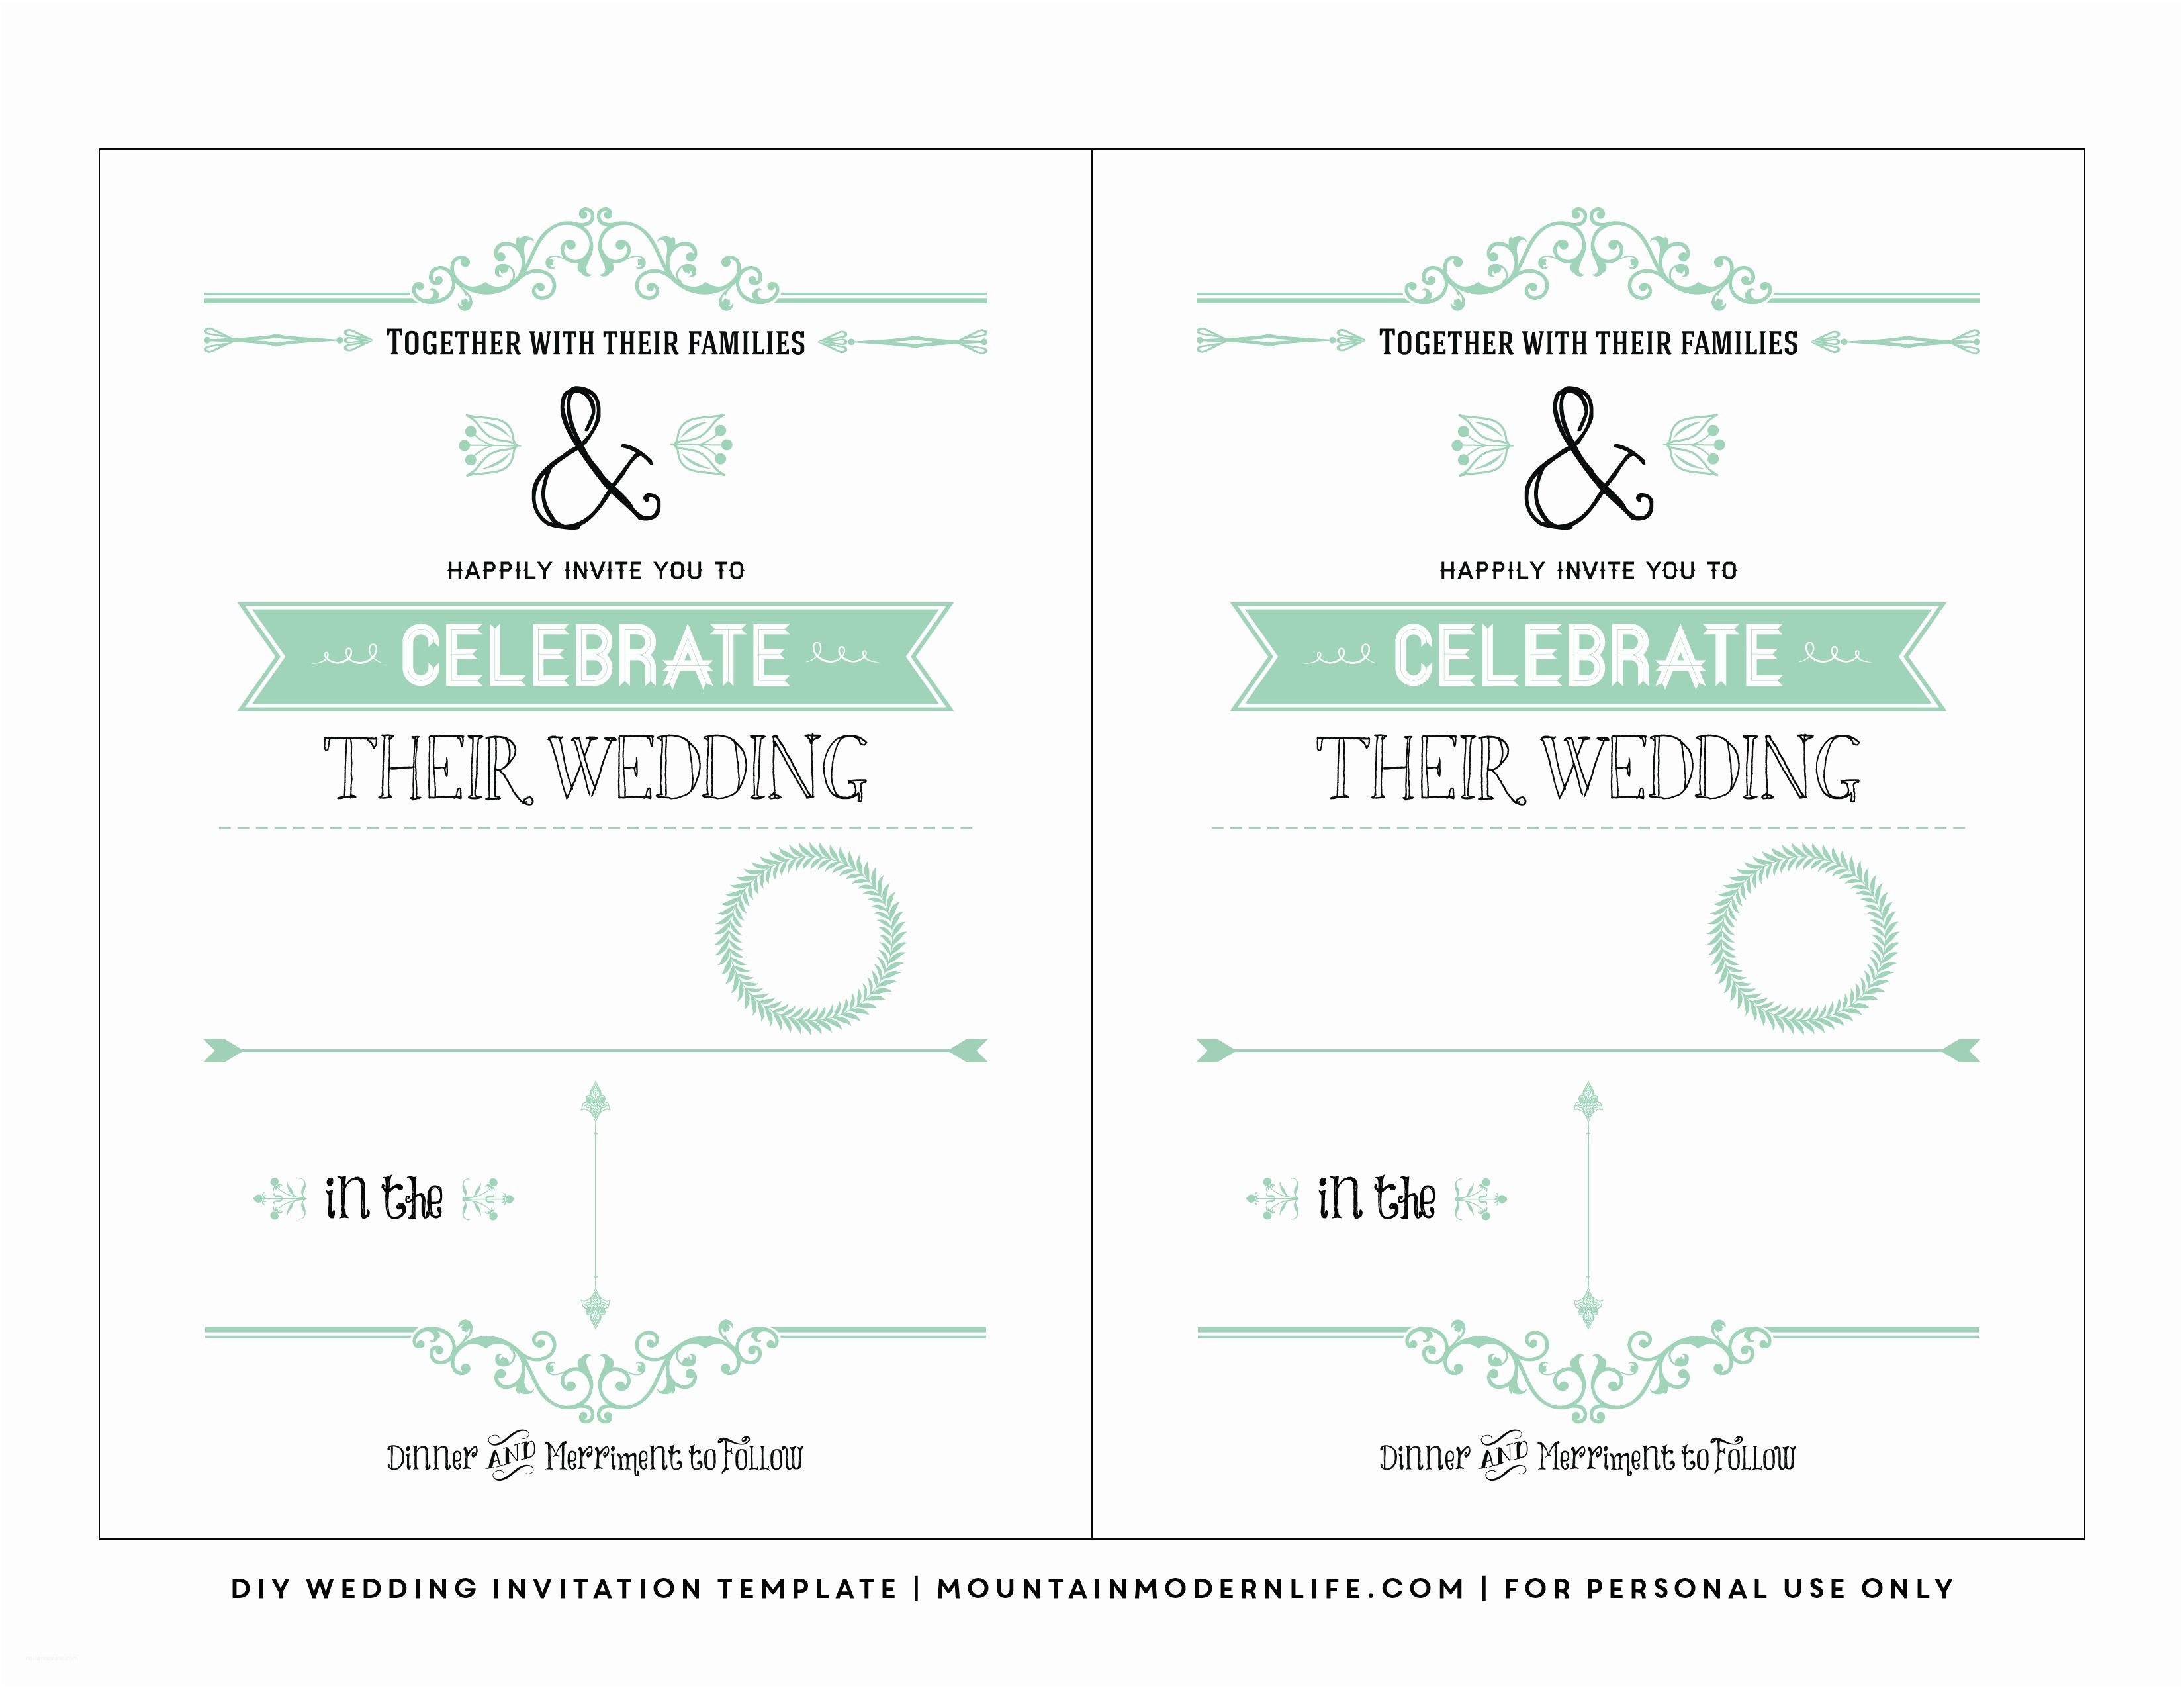 Wedding Invite Directions Template Free Wedding Invitation Template